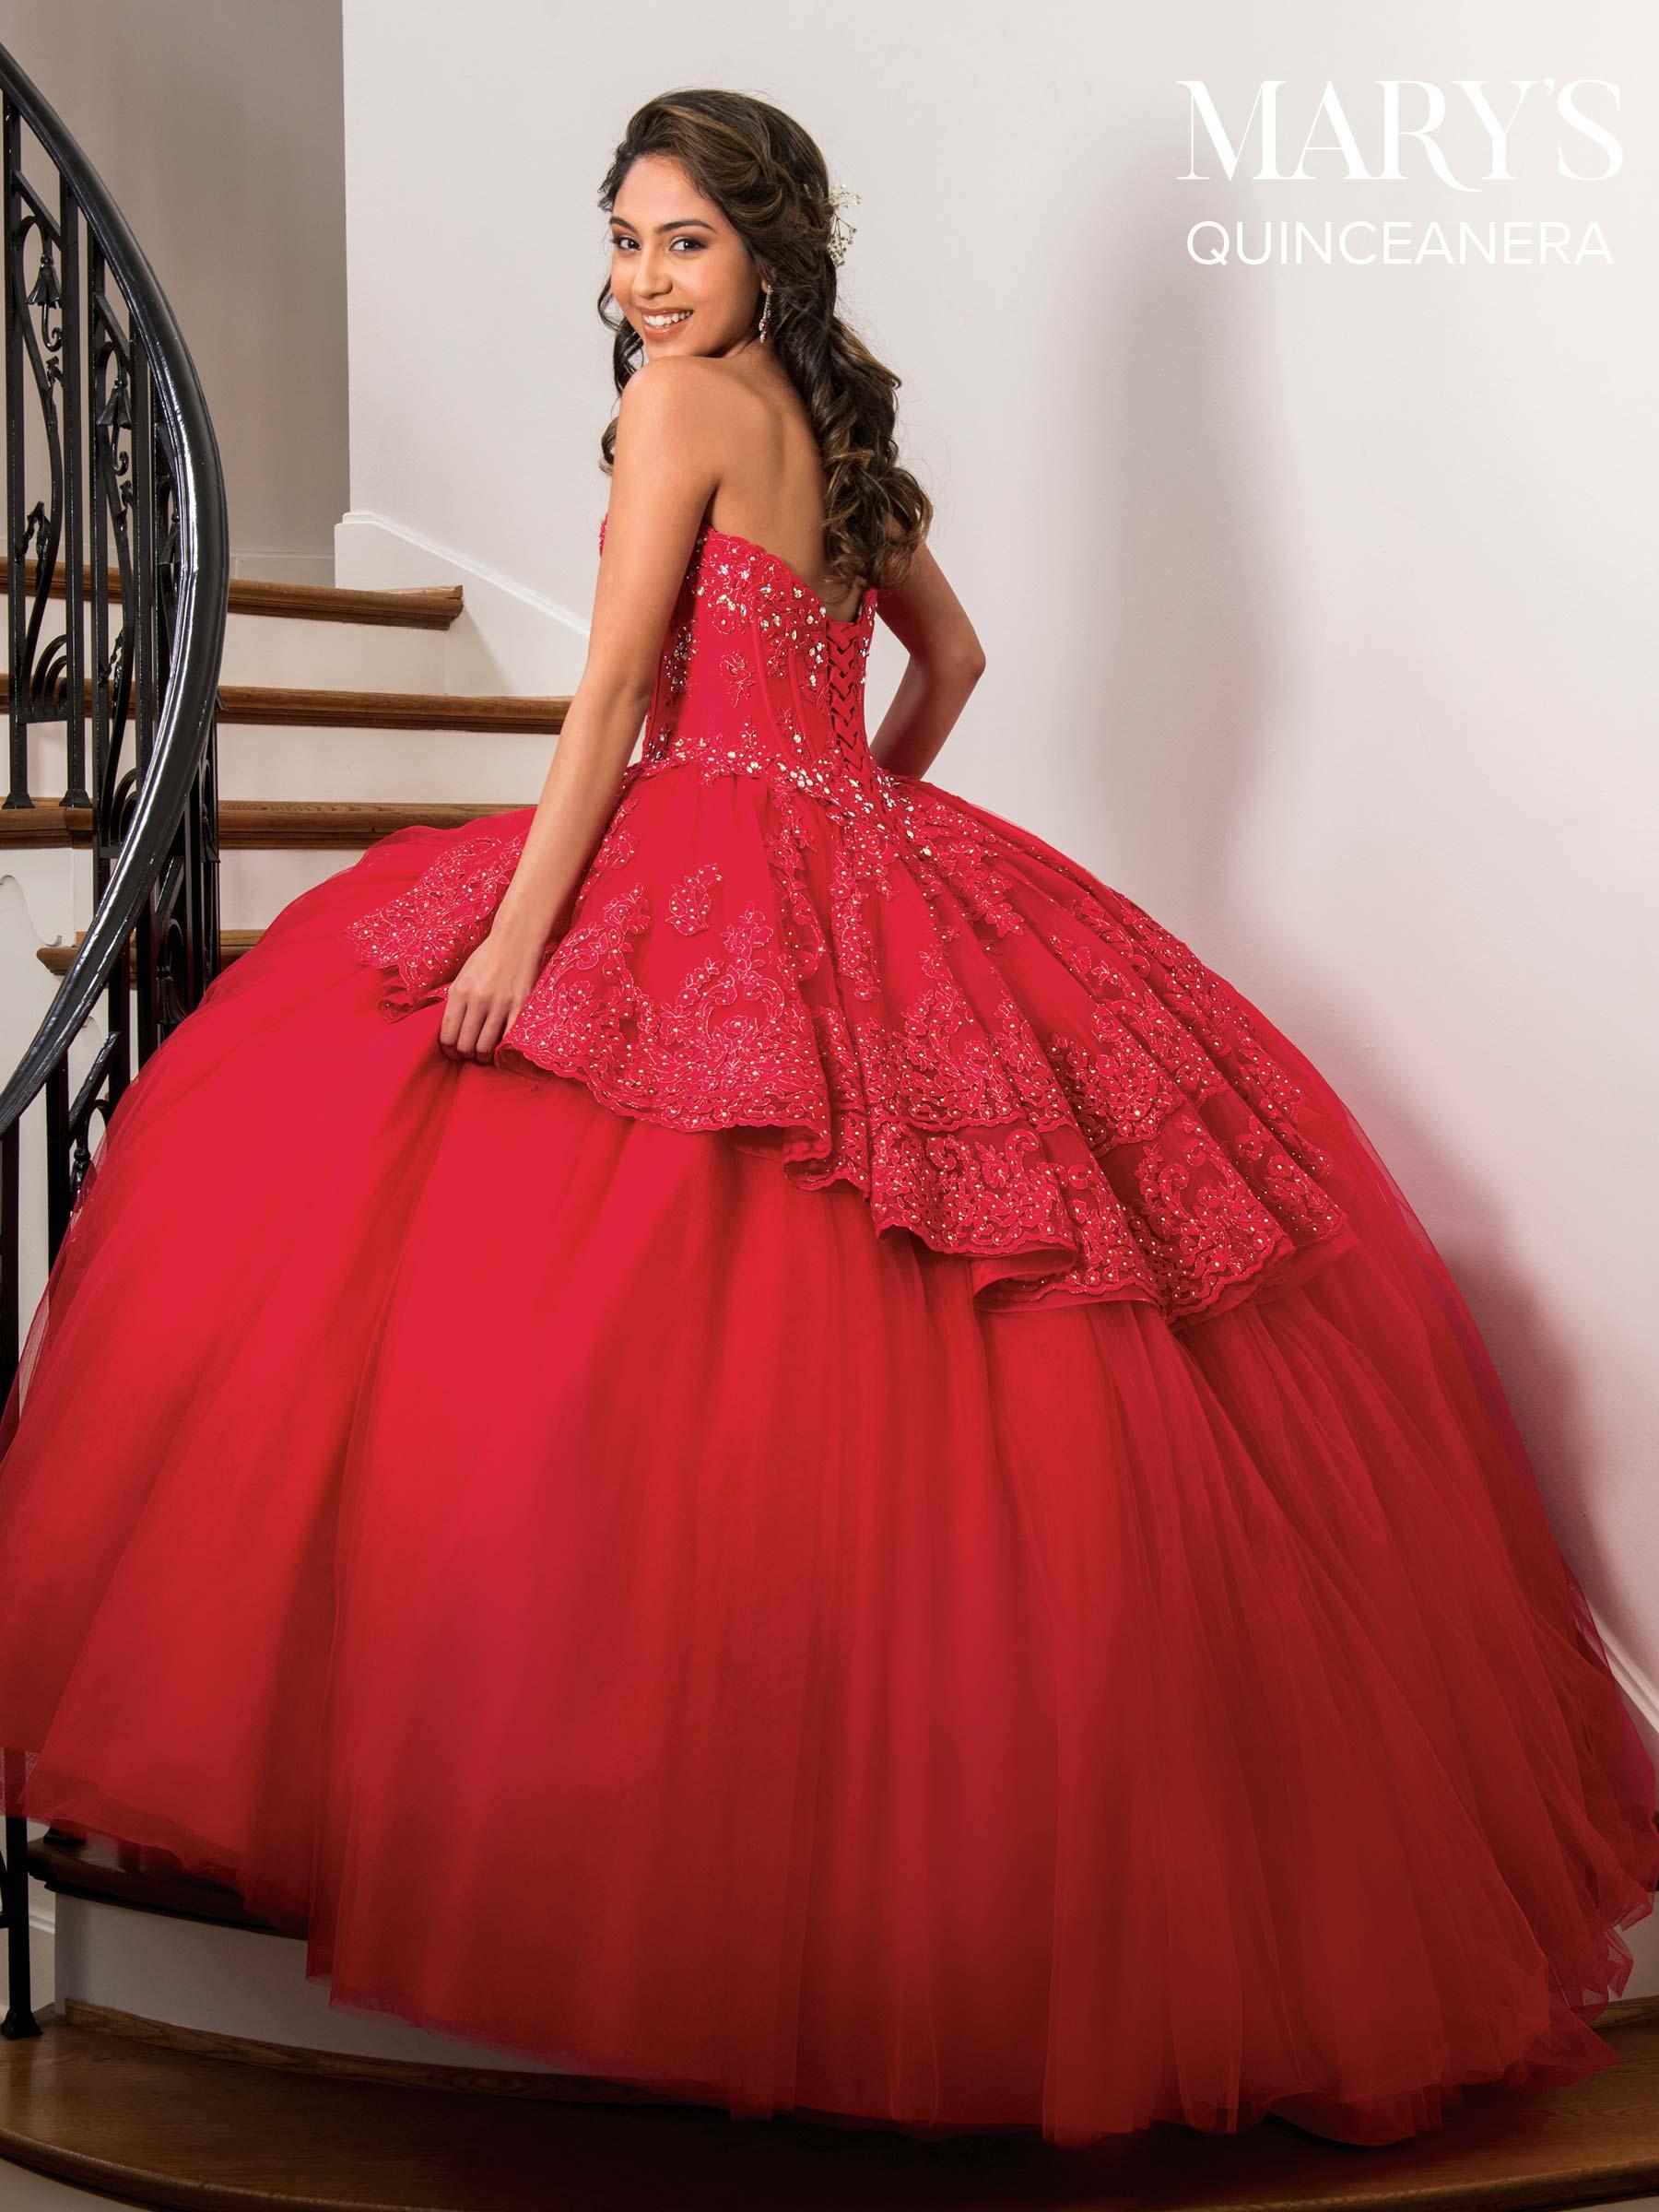 87781d77ea0 Marys Quinceanera Dresses